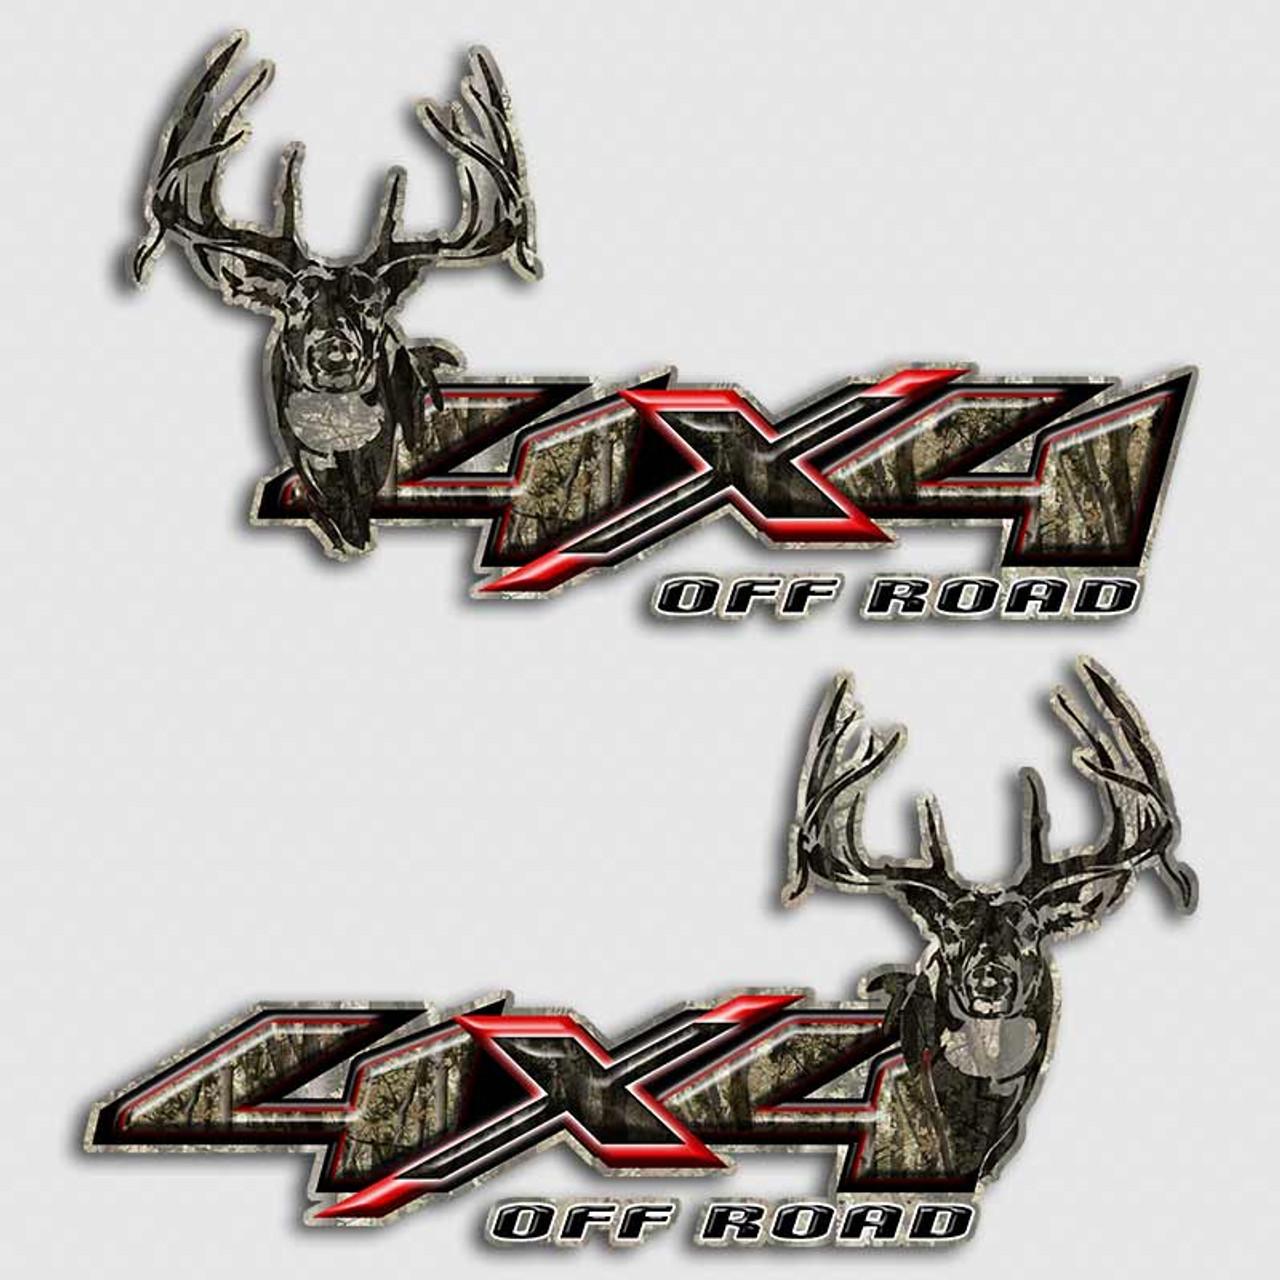 4x4 camouflage red x deer decals